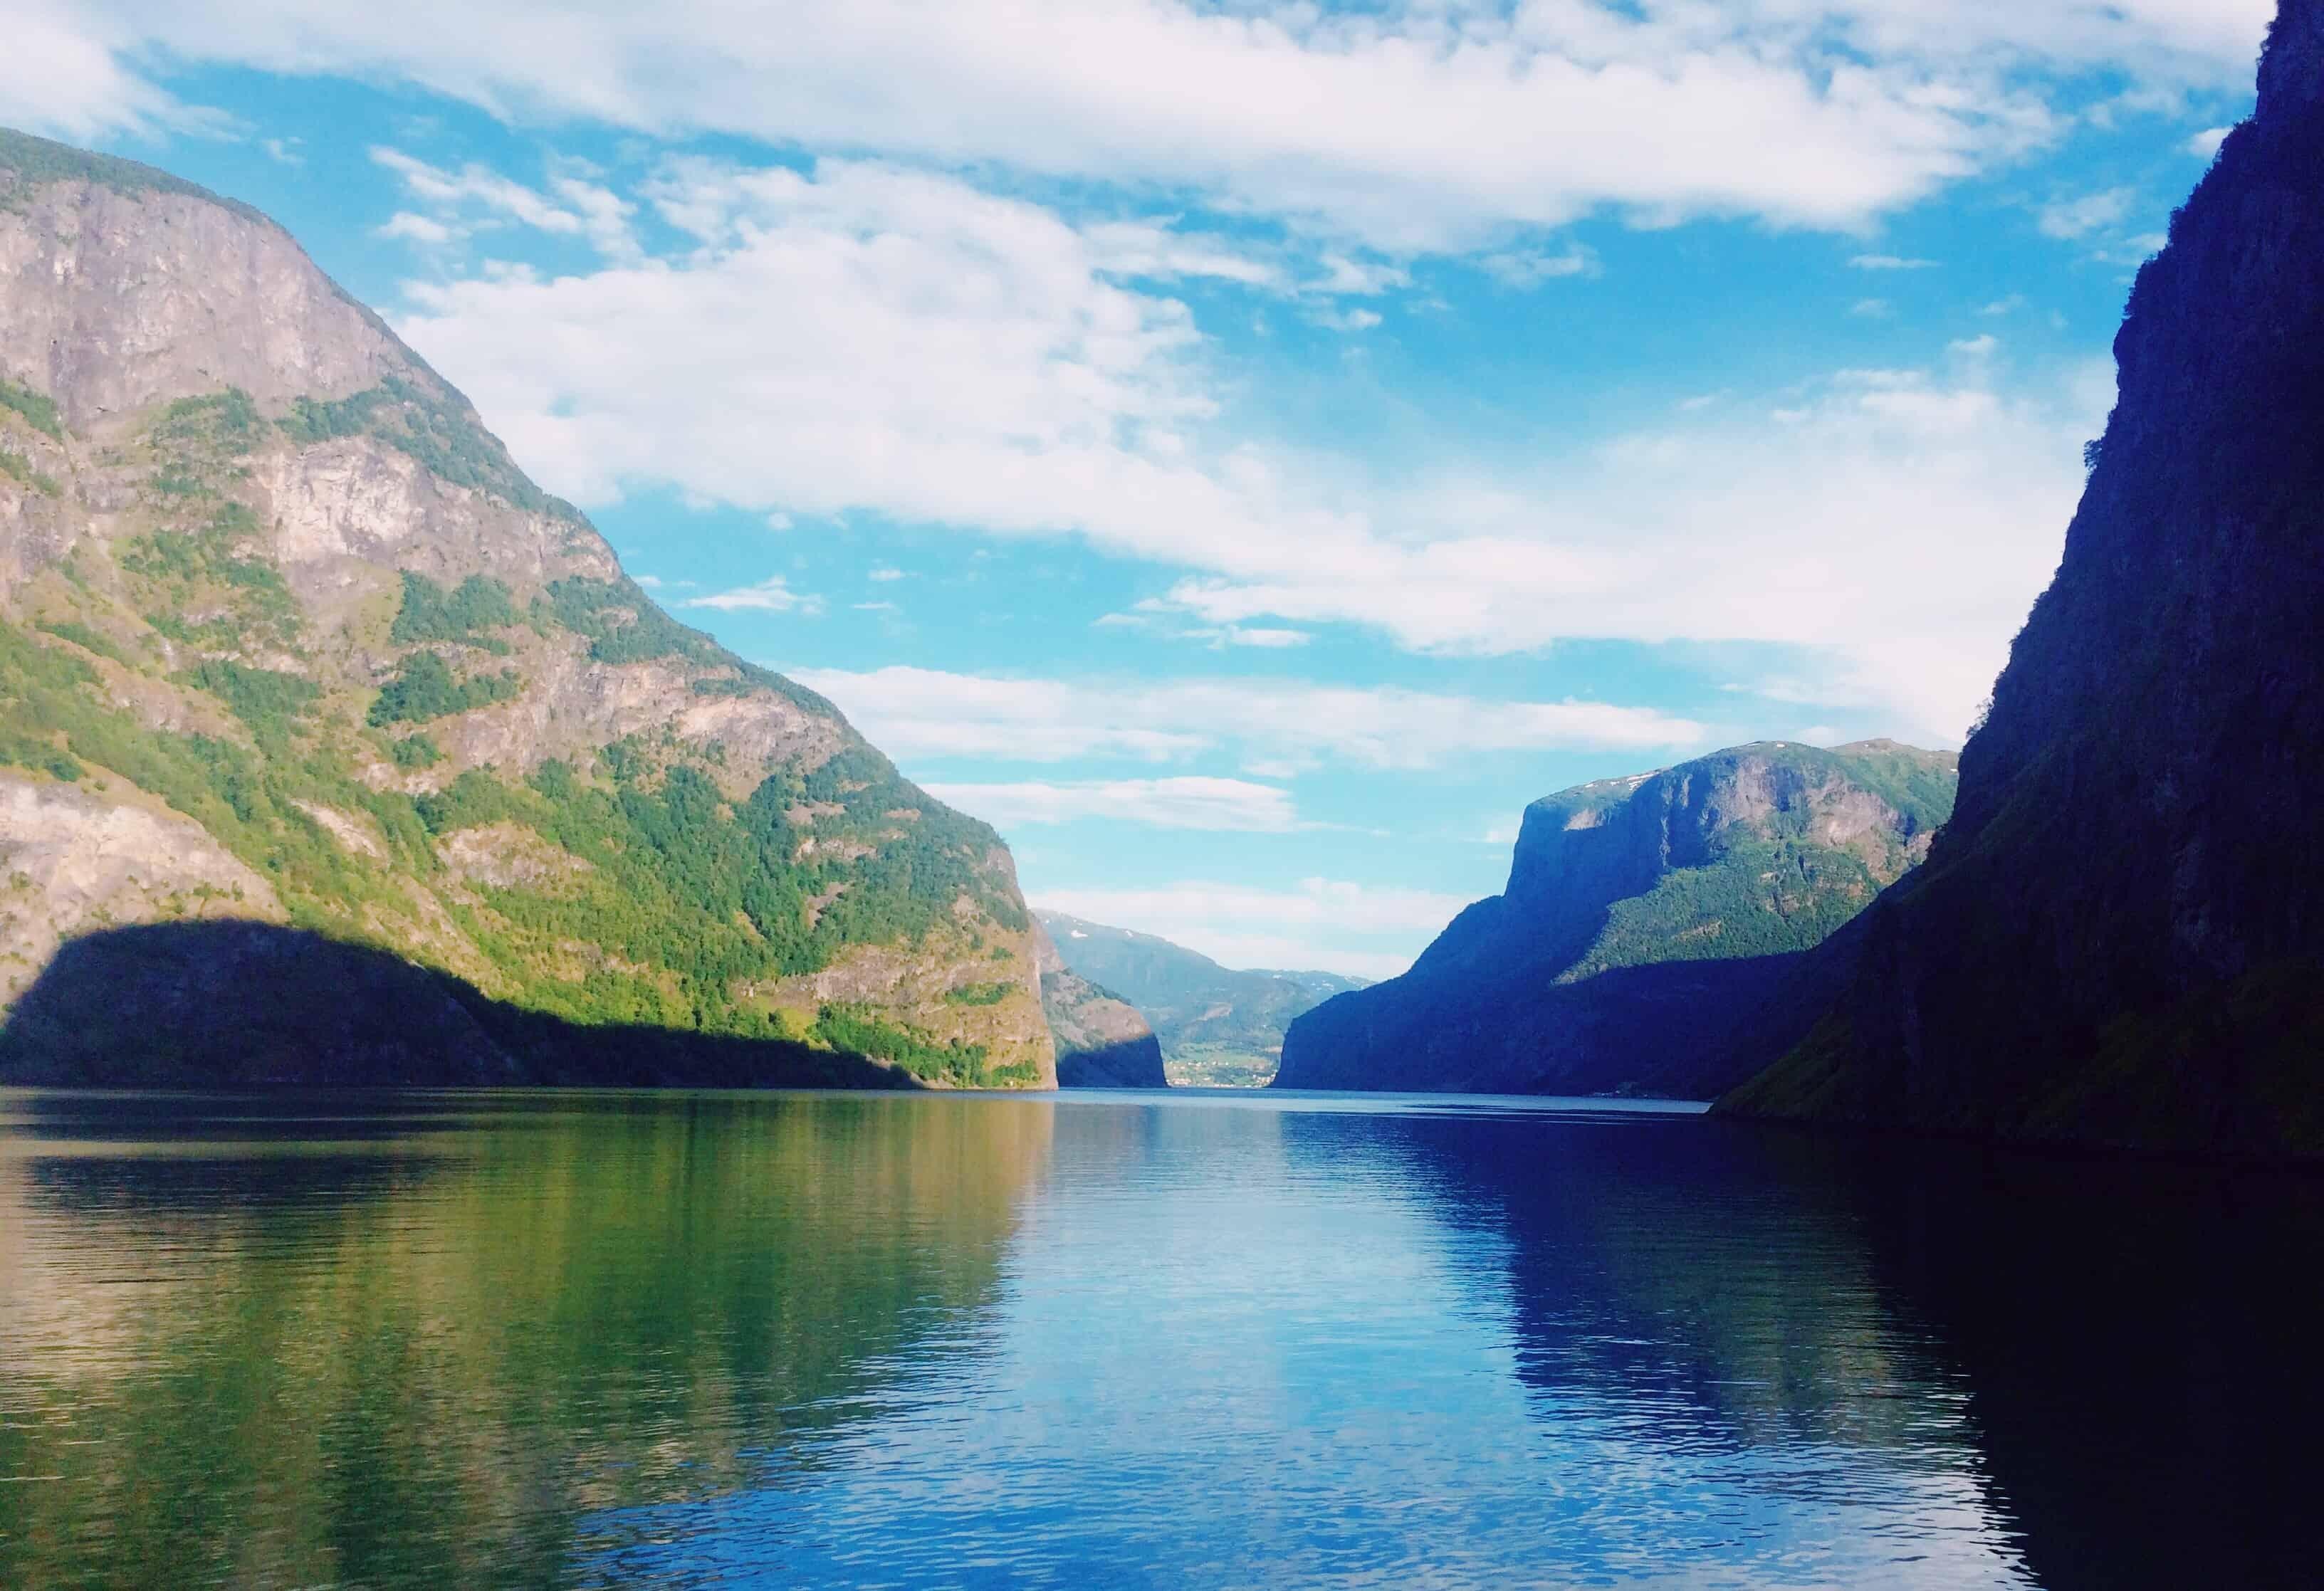 Vedere i fiordi in Norvegia